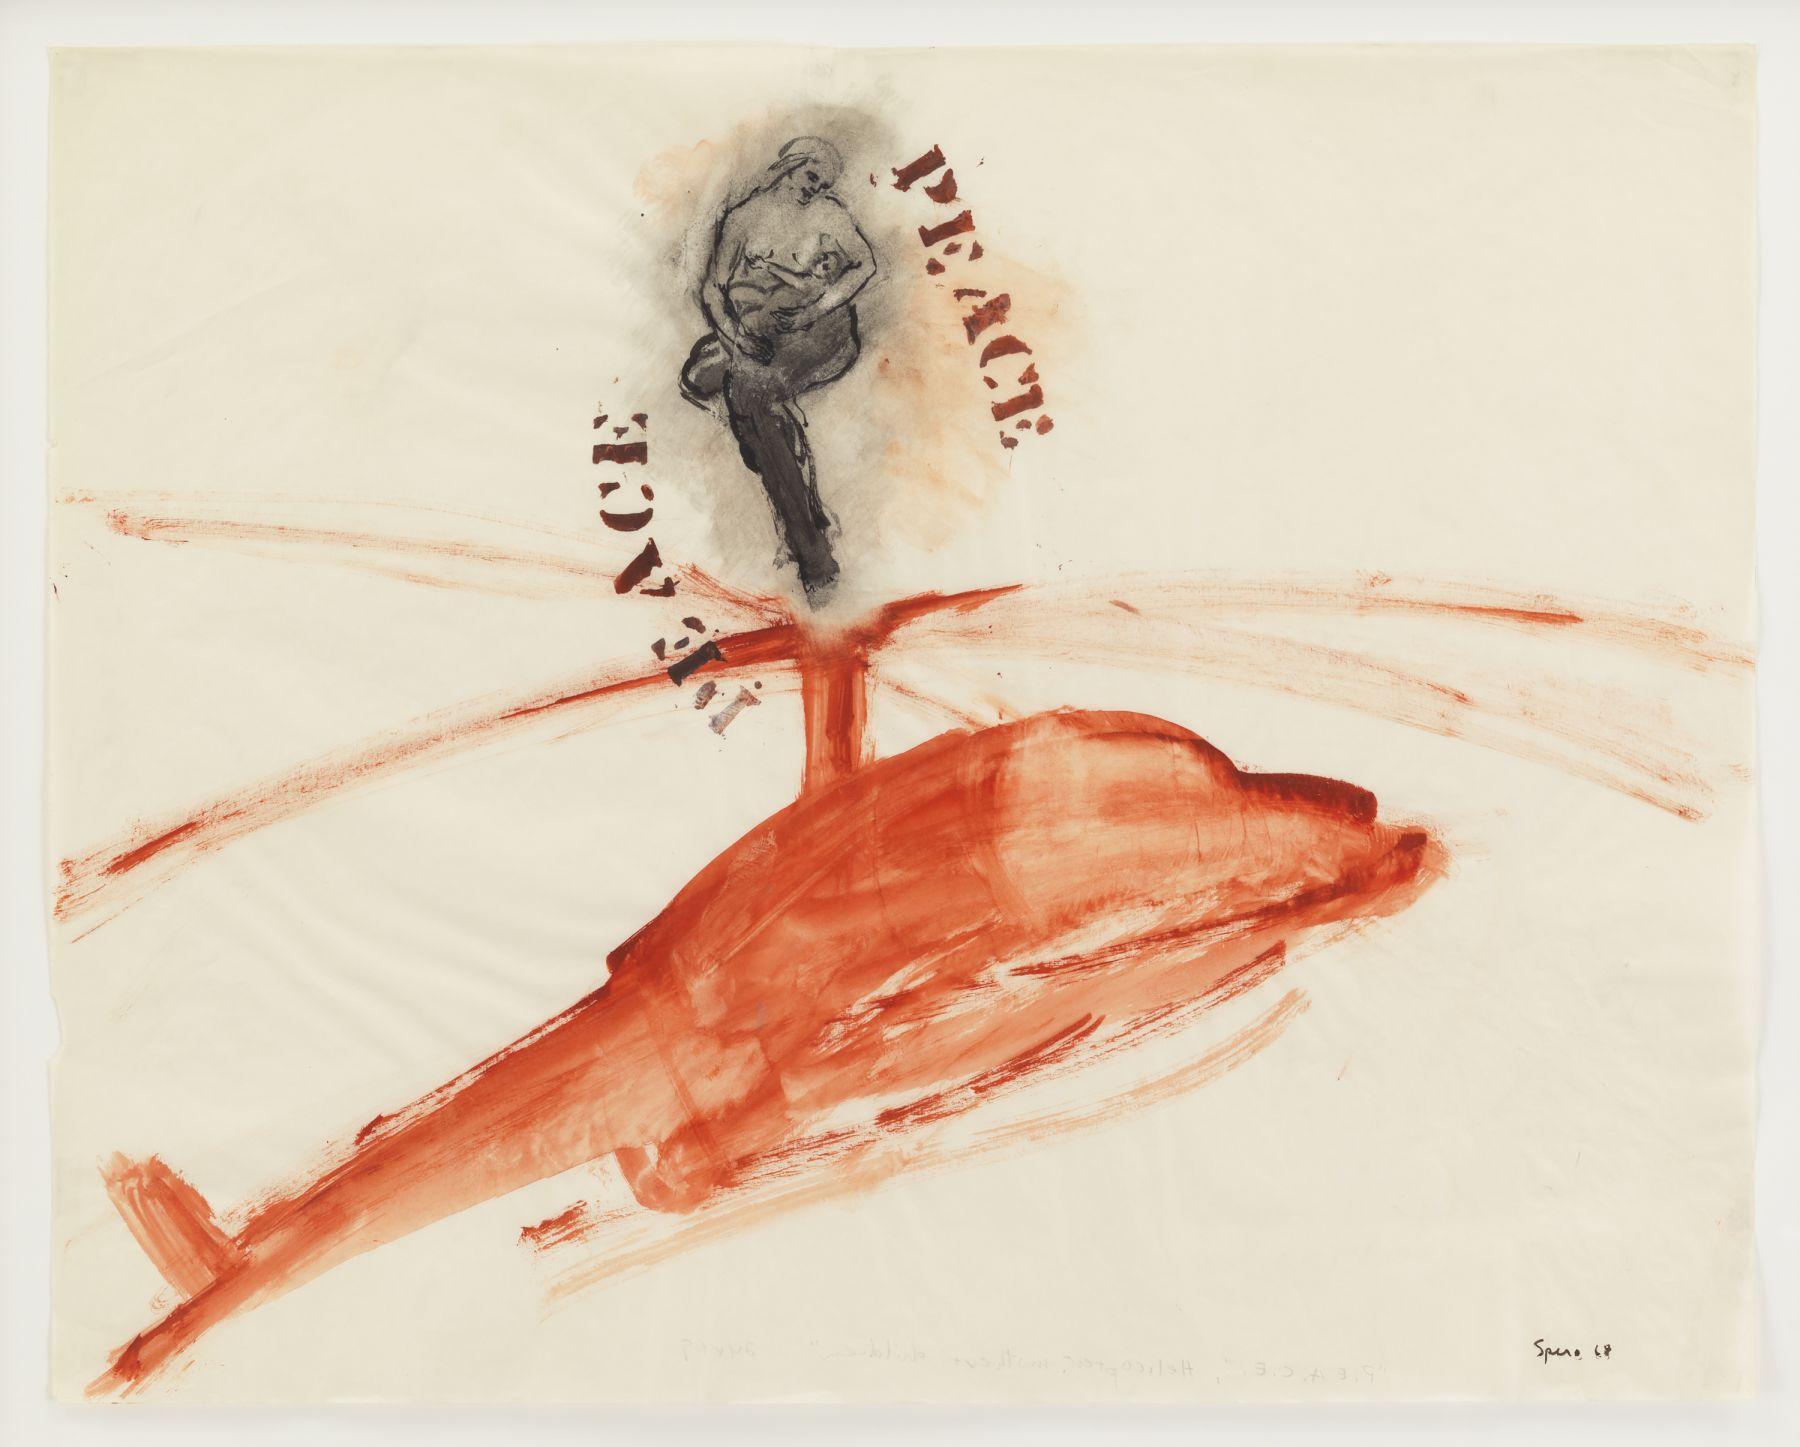 Nancy Spero, P.E.A.C.E., Helicopter, Mother + Children, 1968